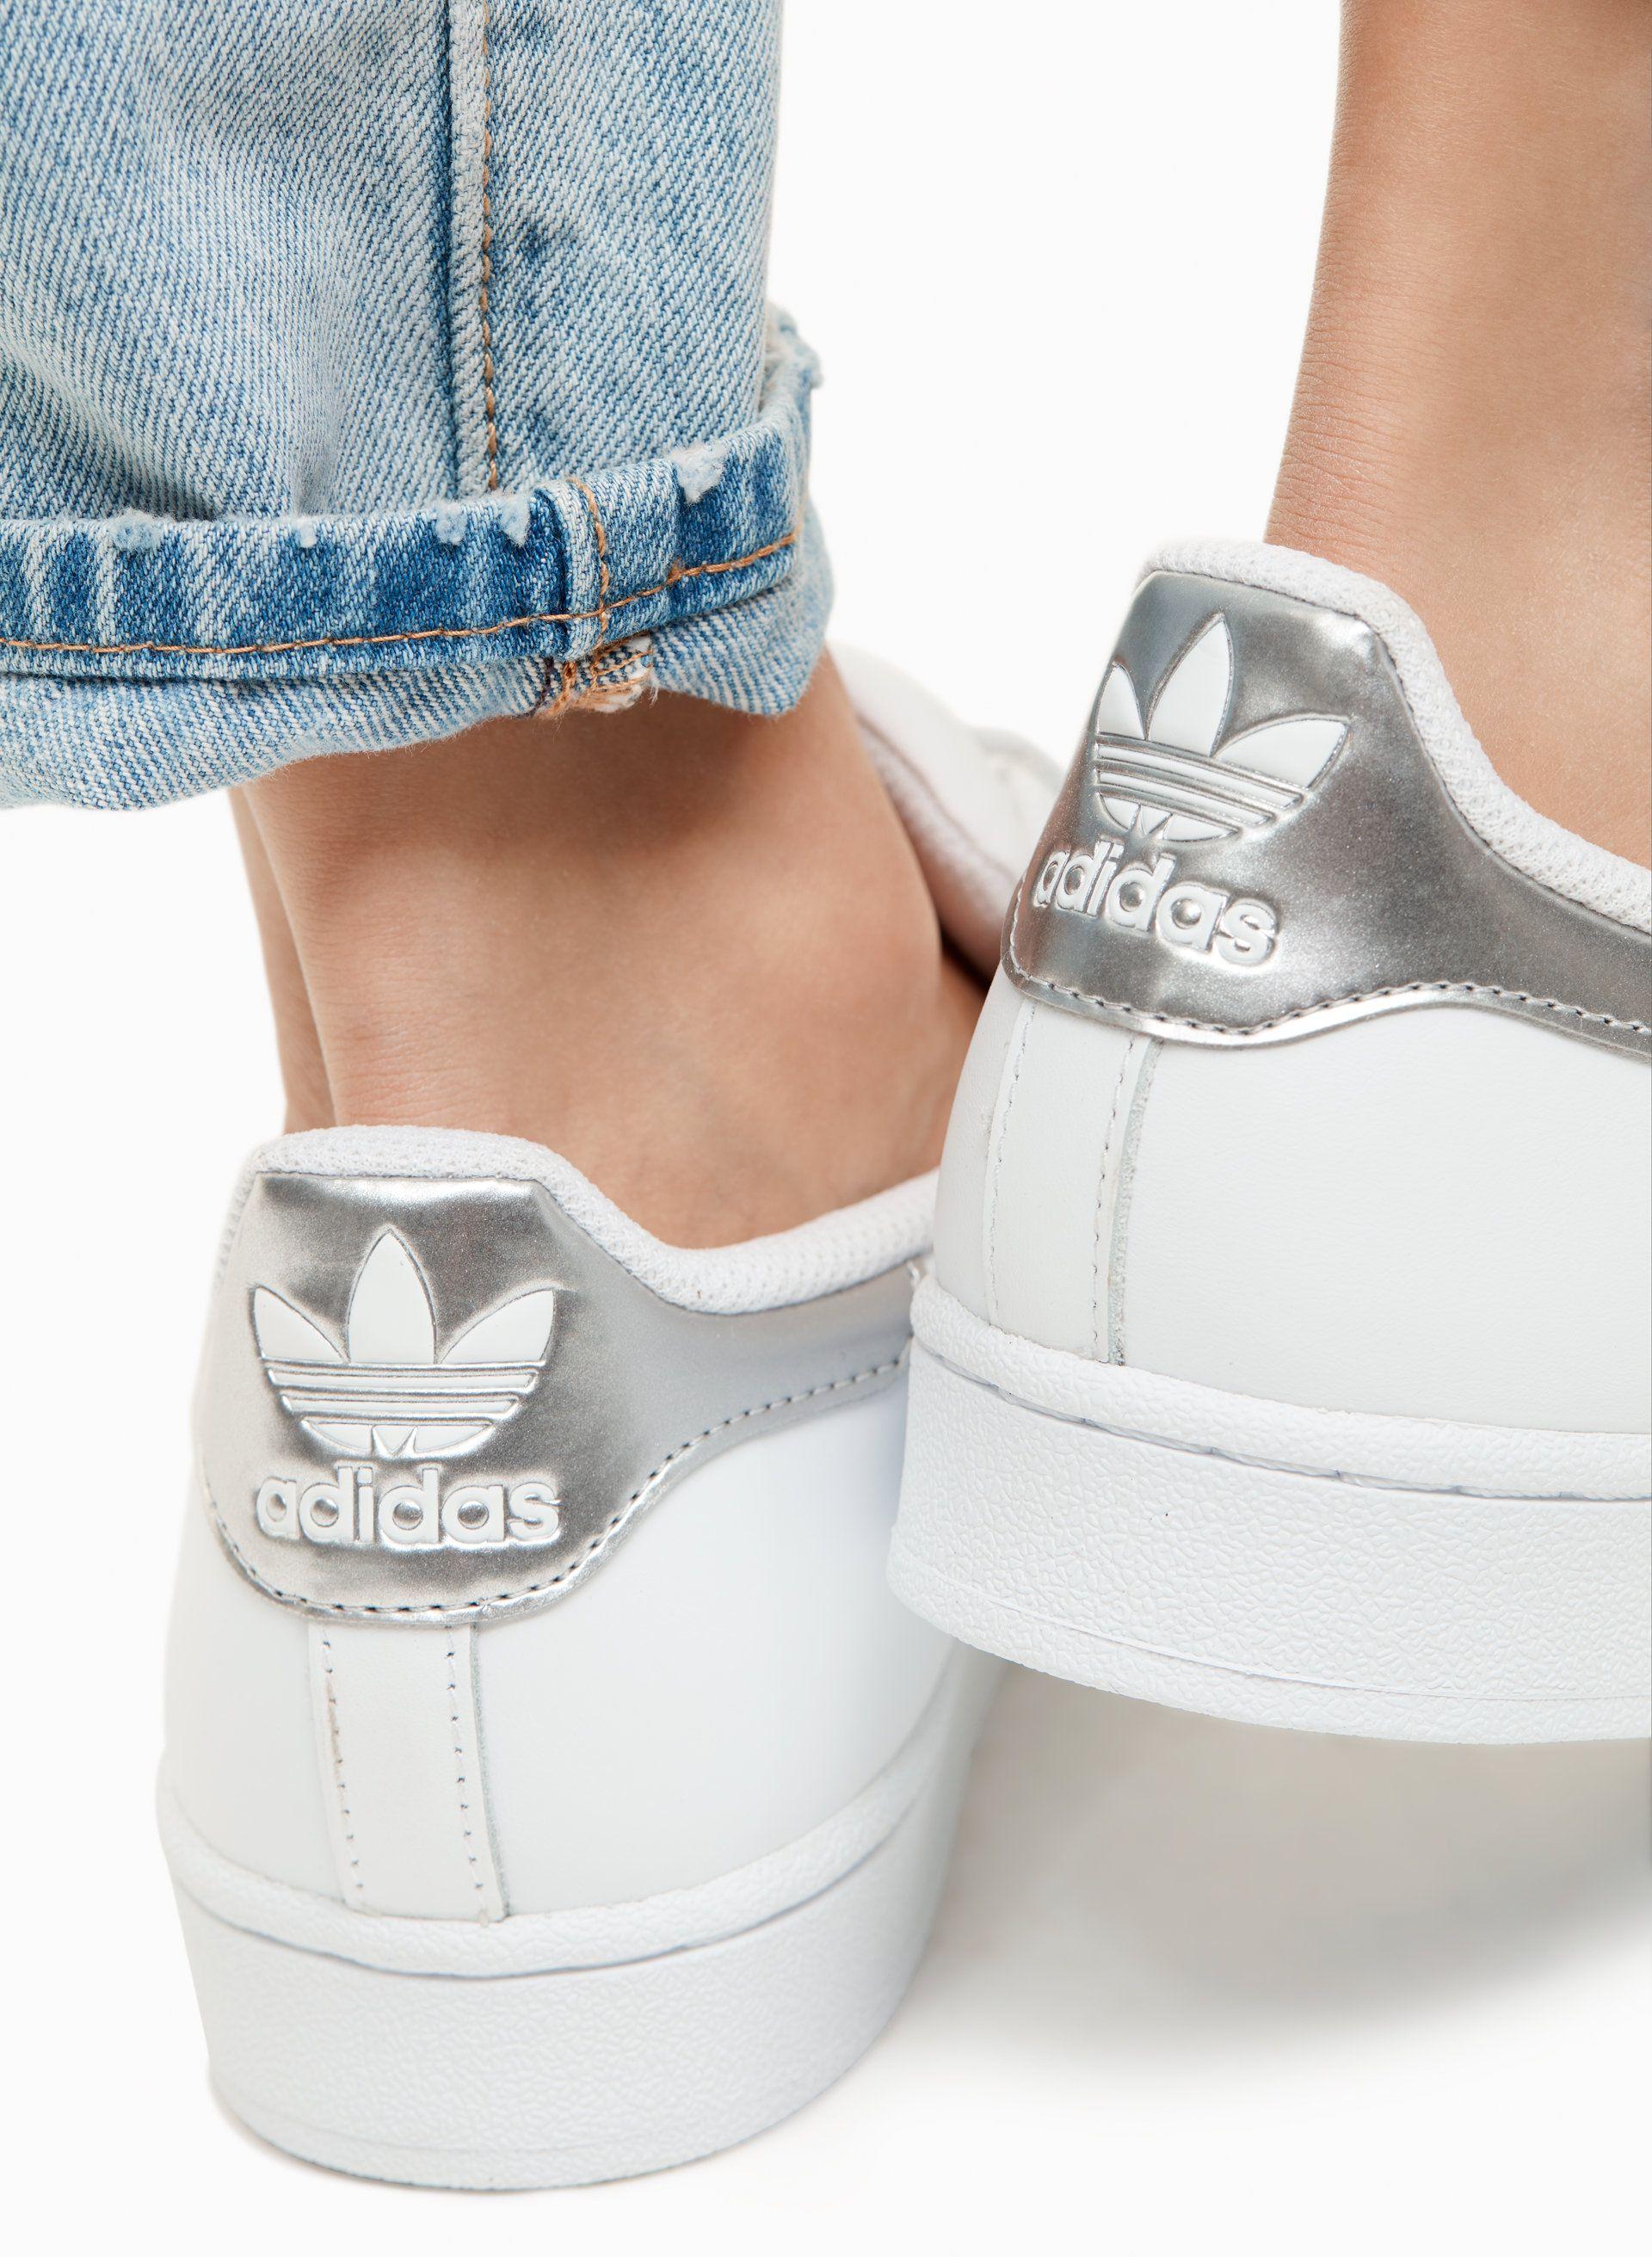 new style 5db2b 86218 adidas SUPERSTAR SNEAKER   Aritzia http   feedproxy.google.com  fashiongoshoesa1